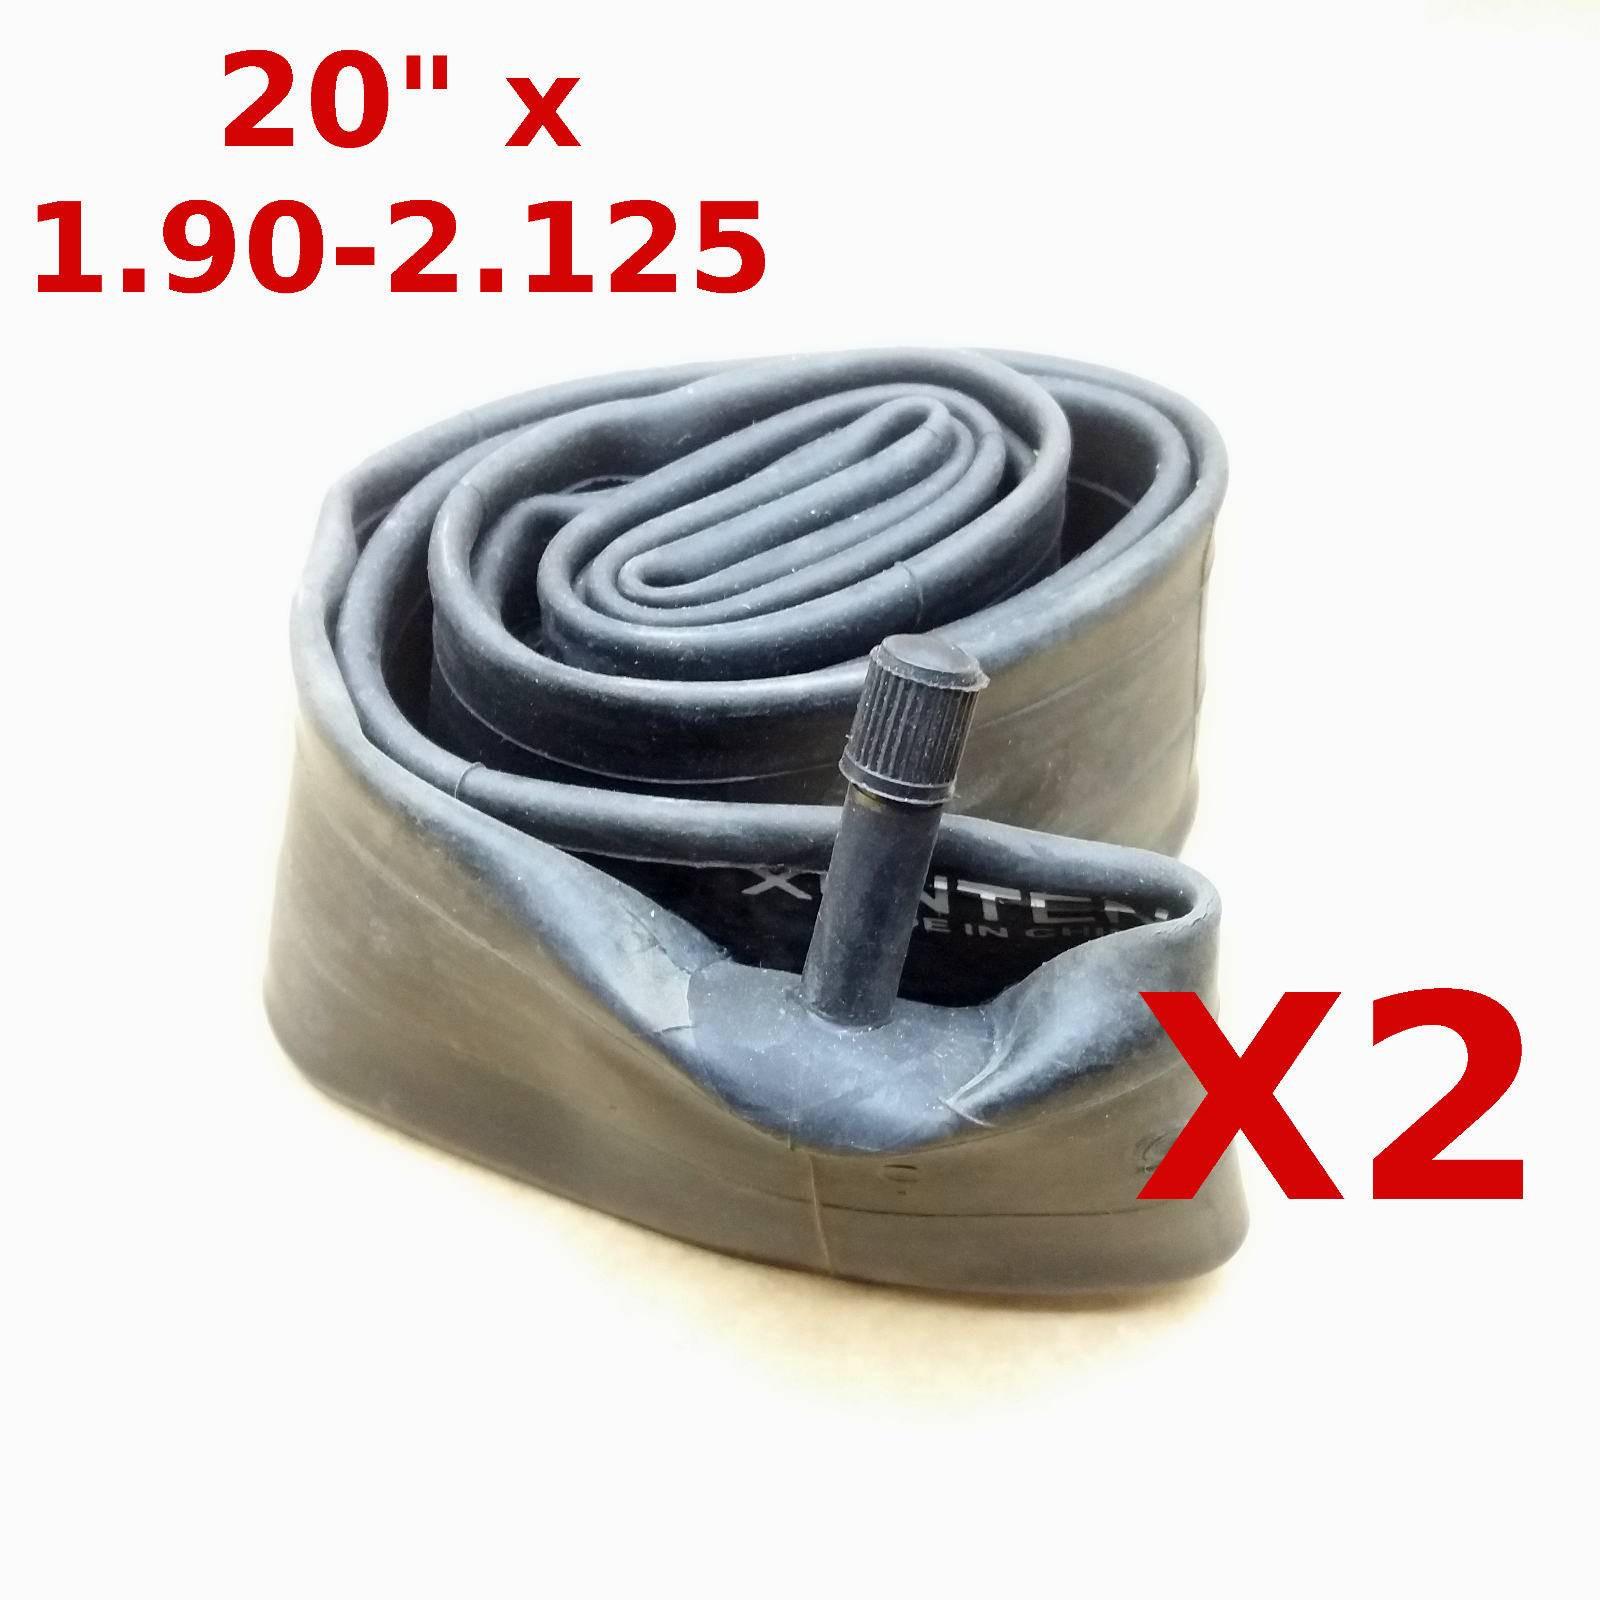 "2 X BICYCLE TUBES 20"" X 1.90 -2.125 SCHRADER VALVE"